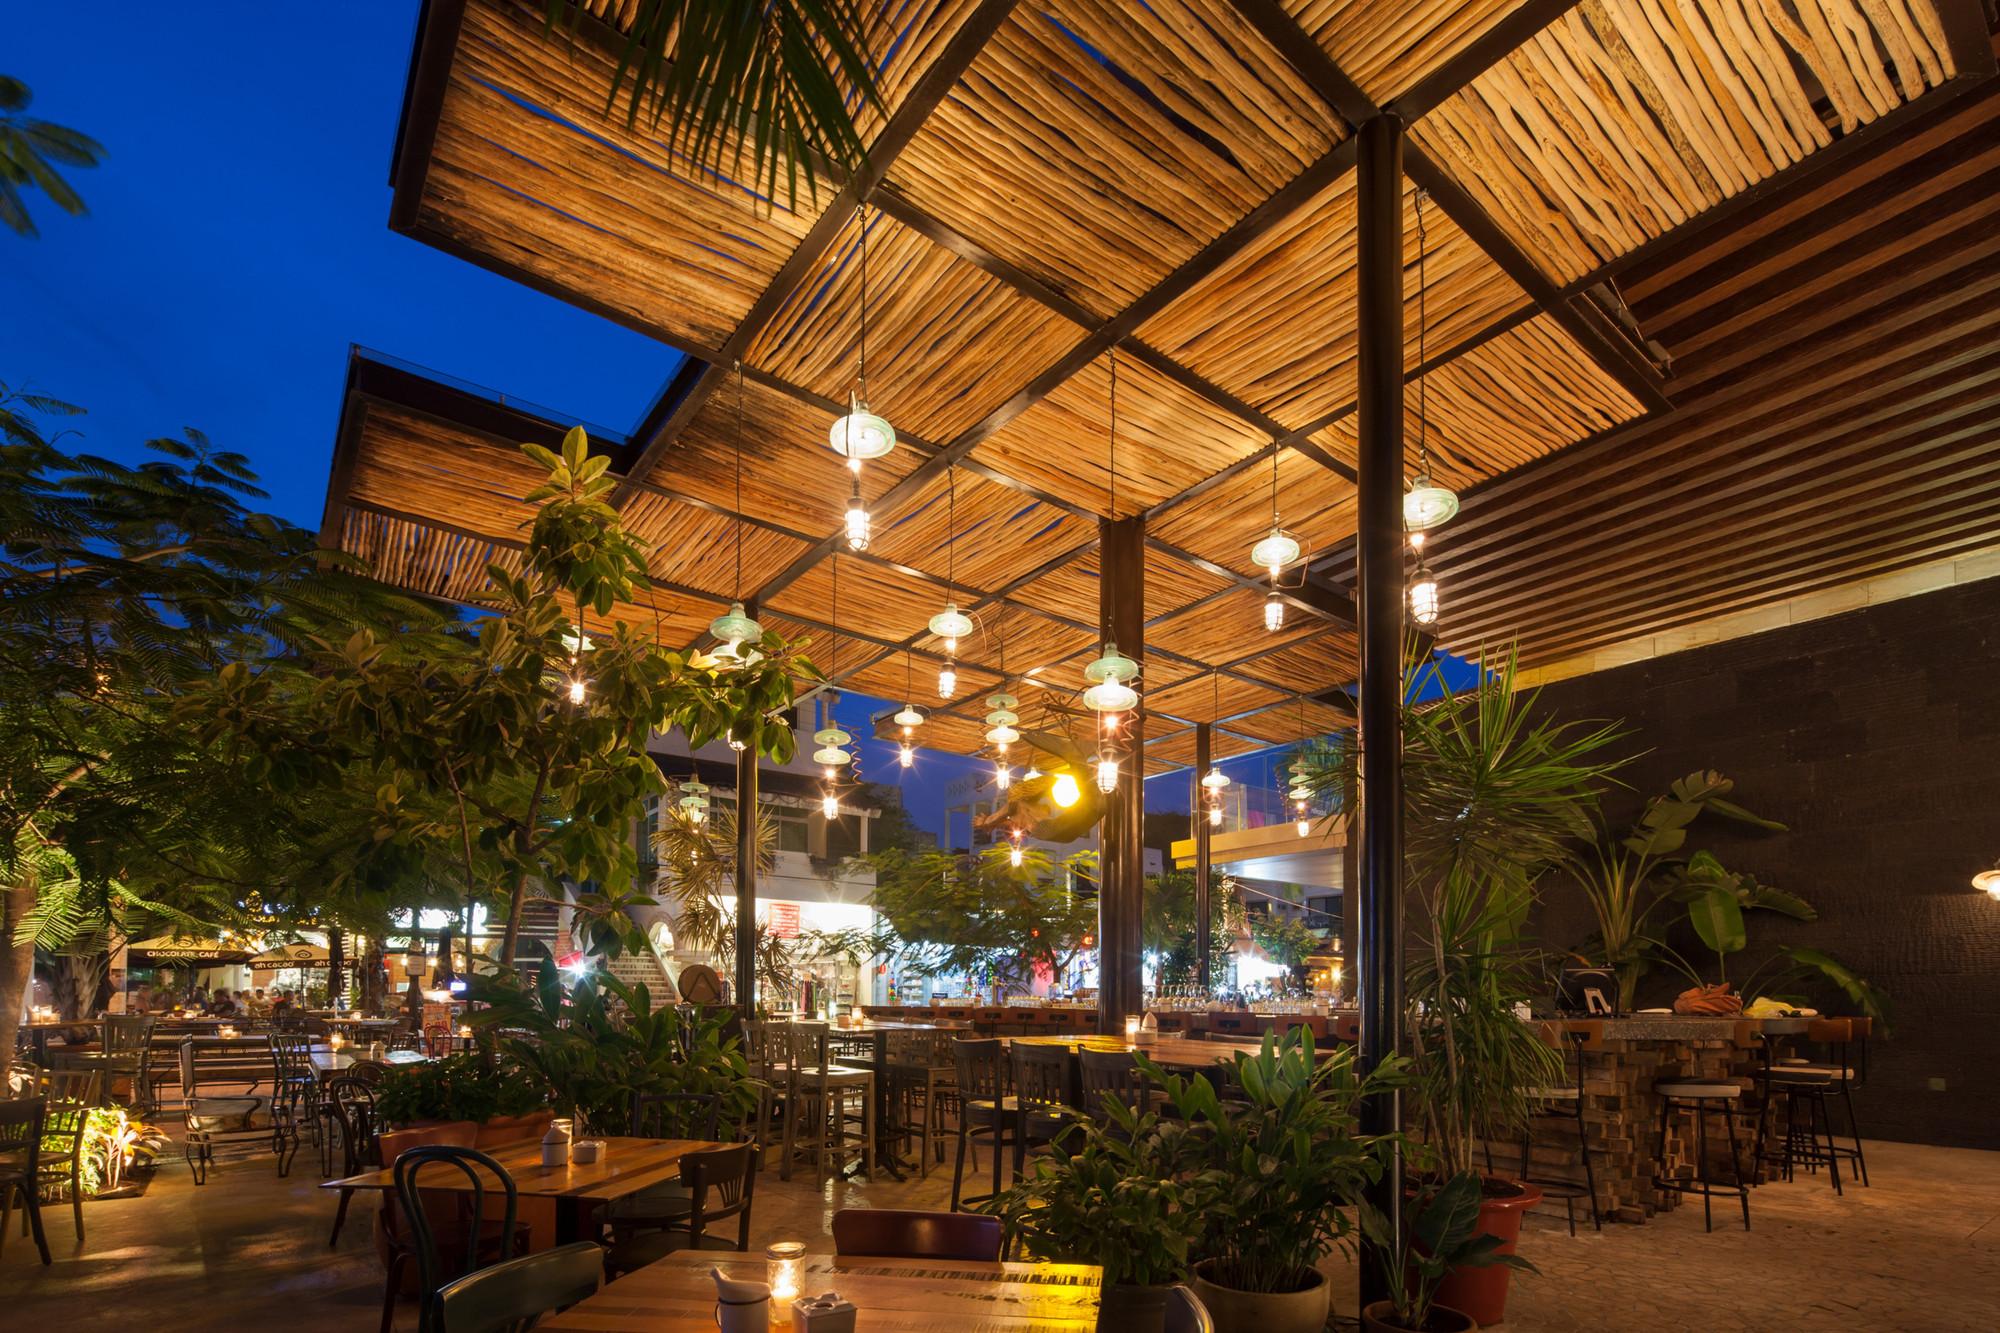 Hotel boutique cacao rdlp arquitectos plataforma for Arquitectura de hoteles